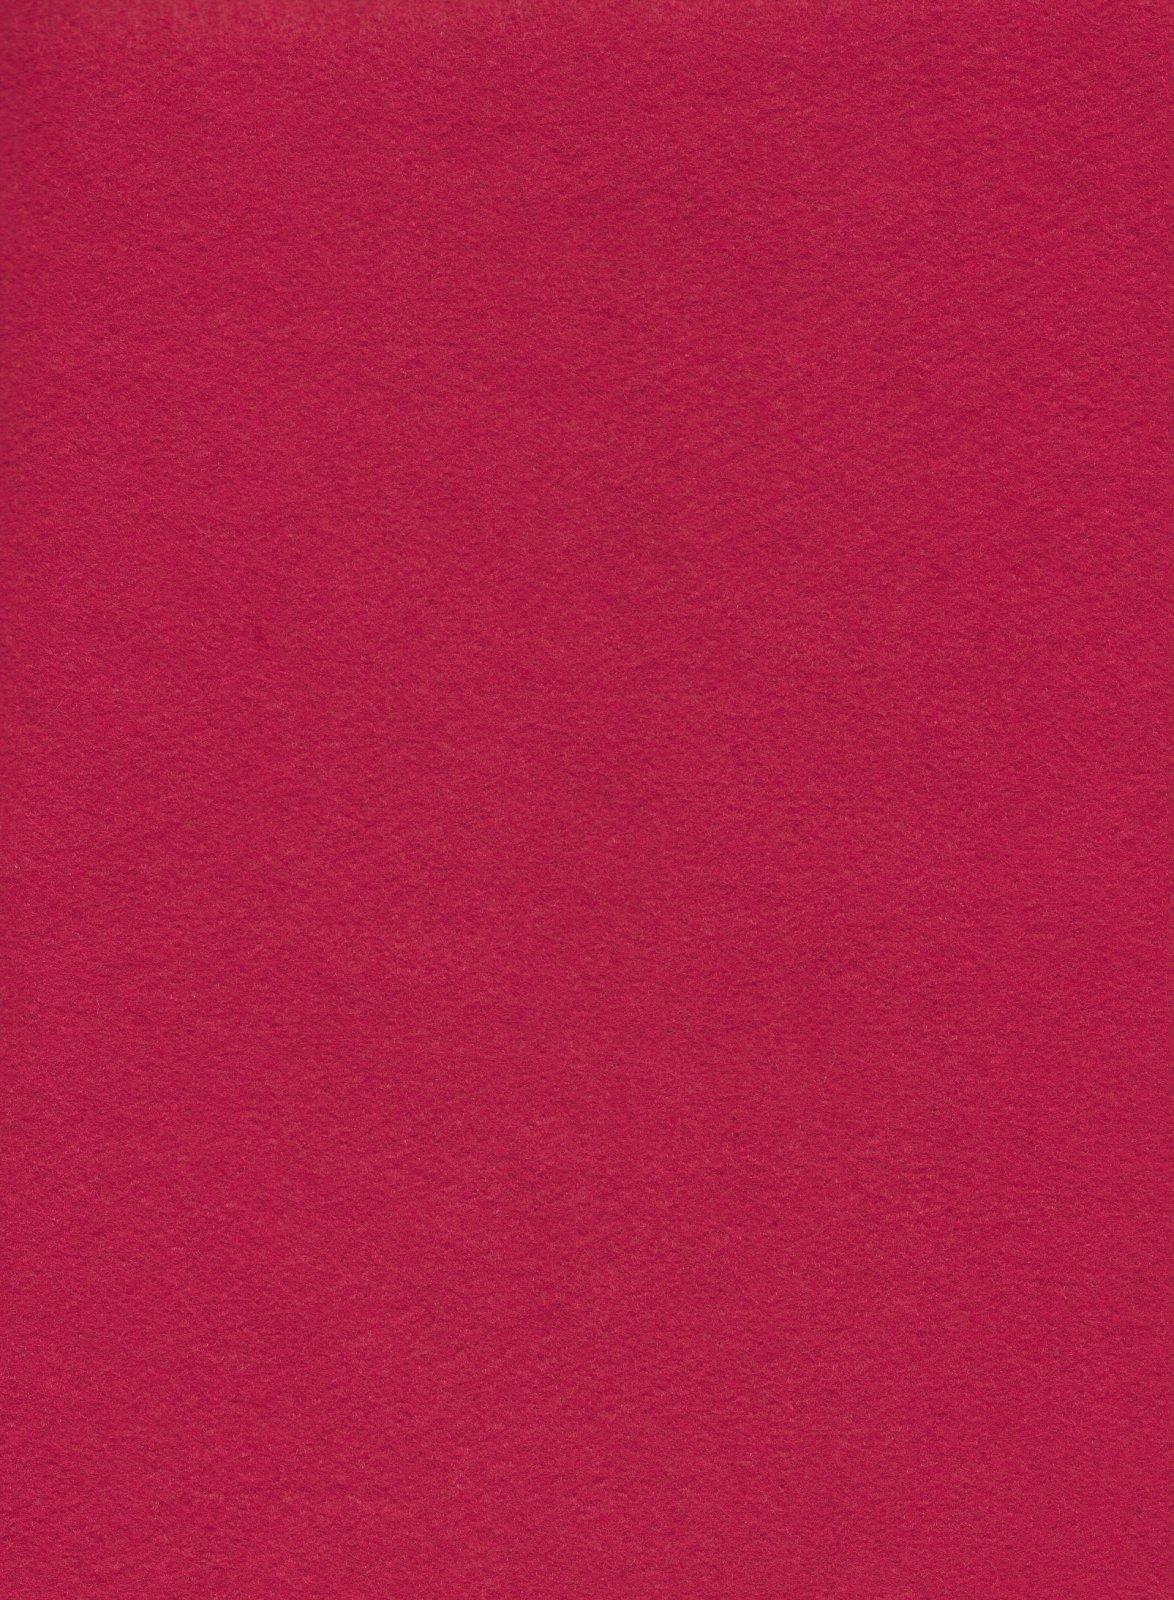 Rose Petal - 12 x 18 Square